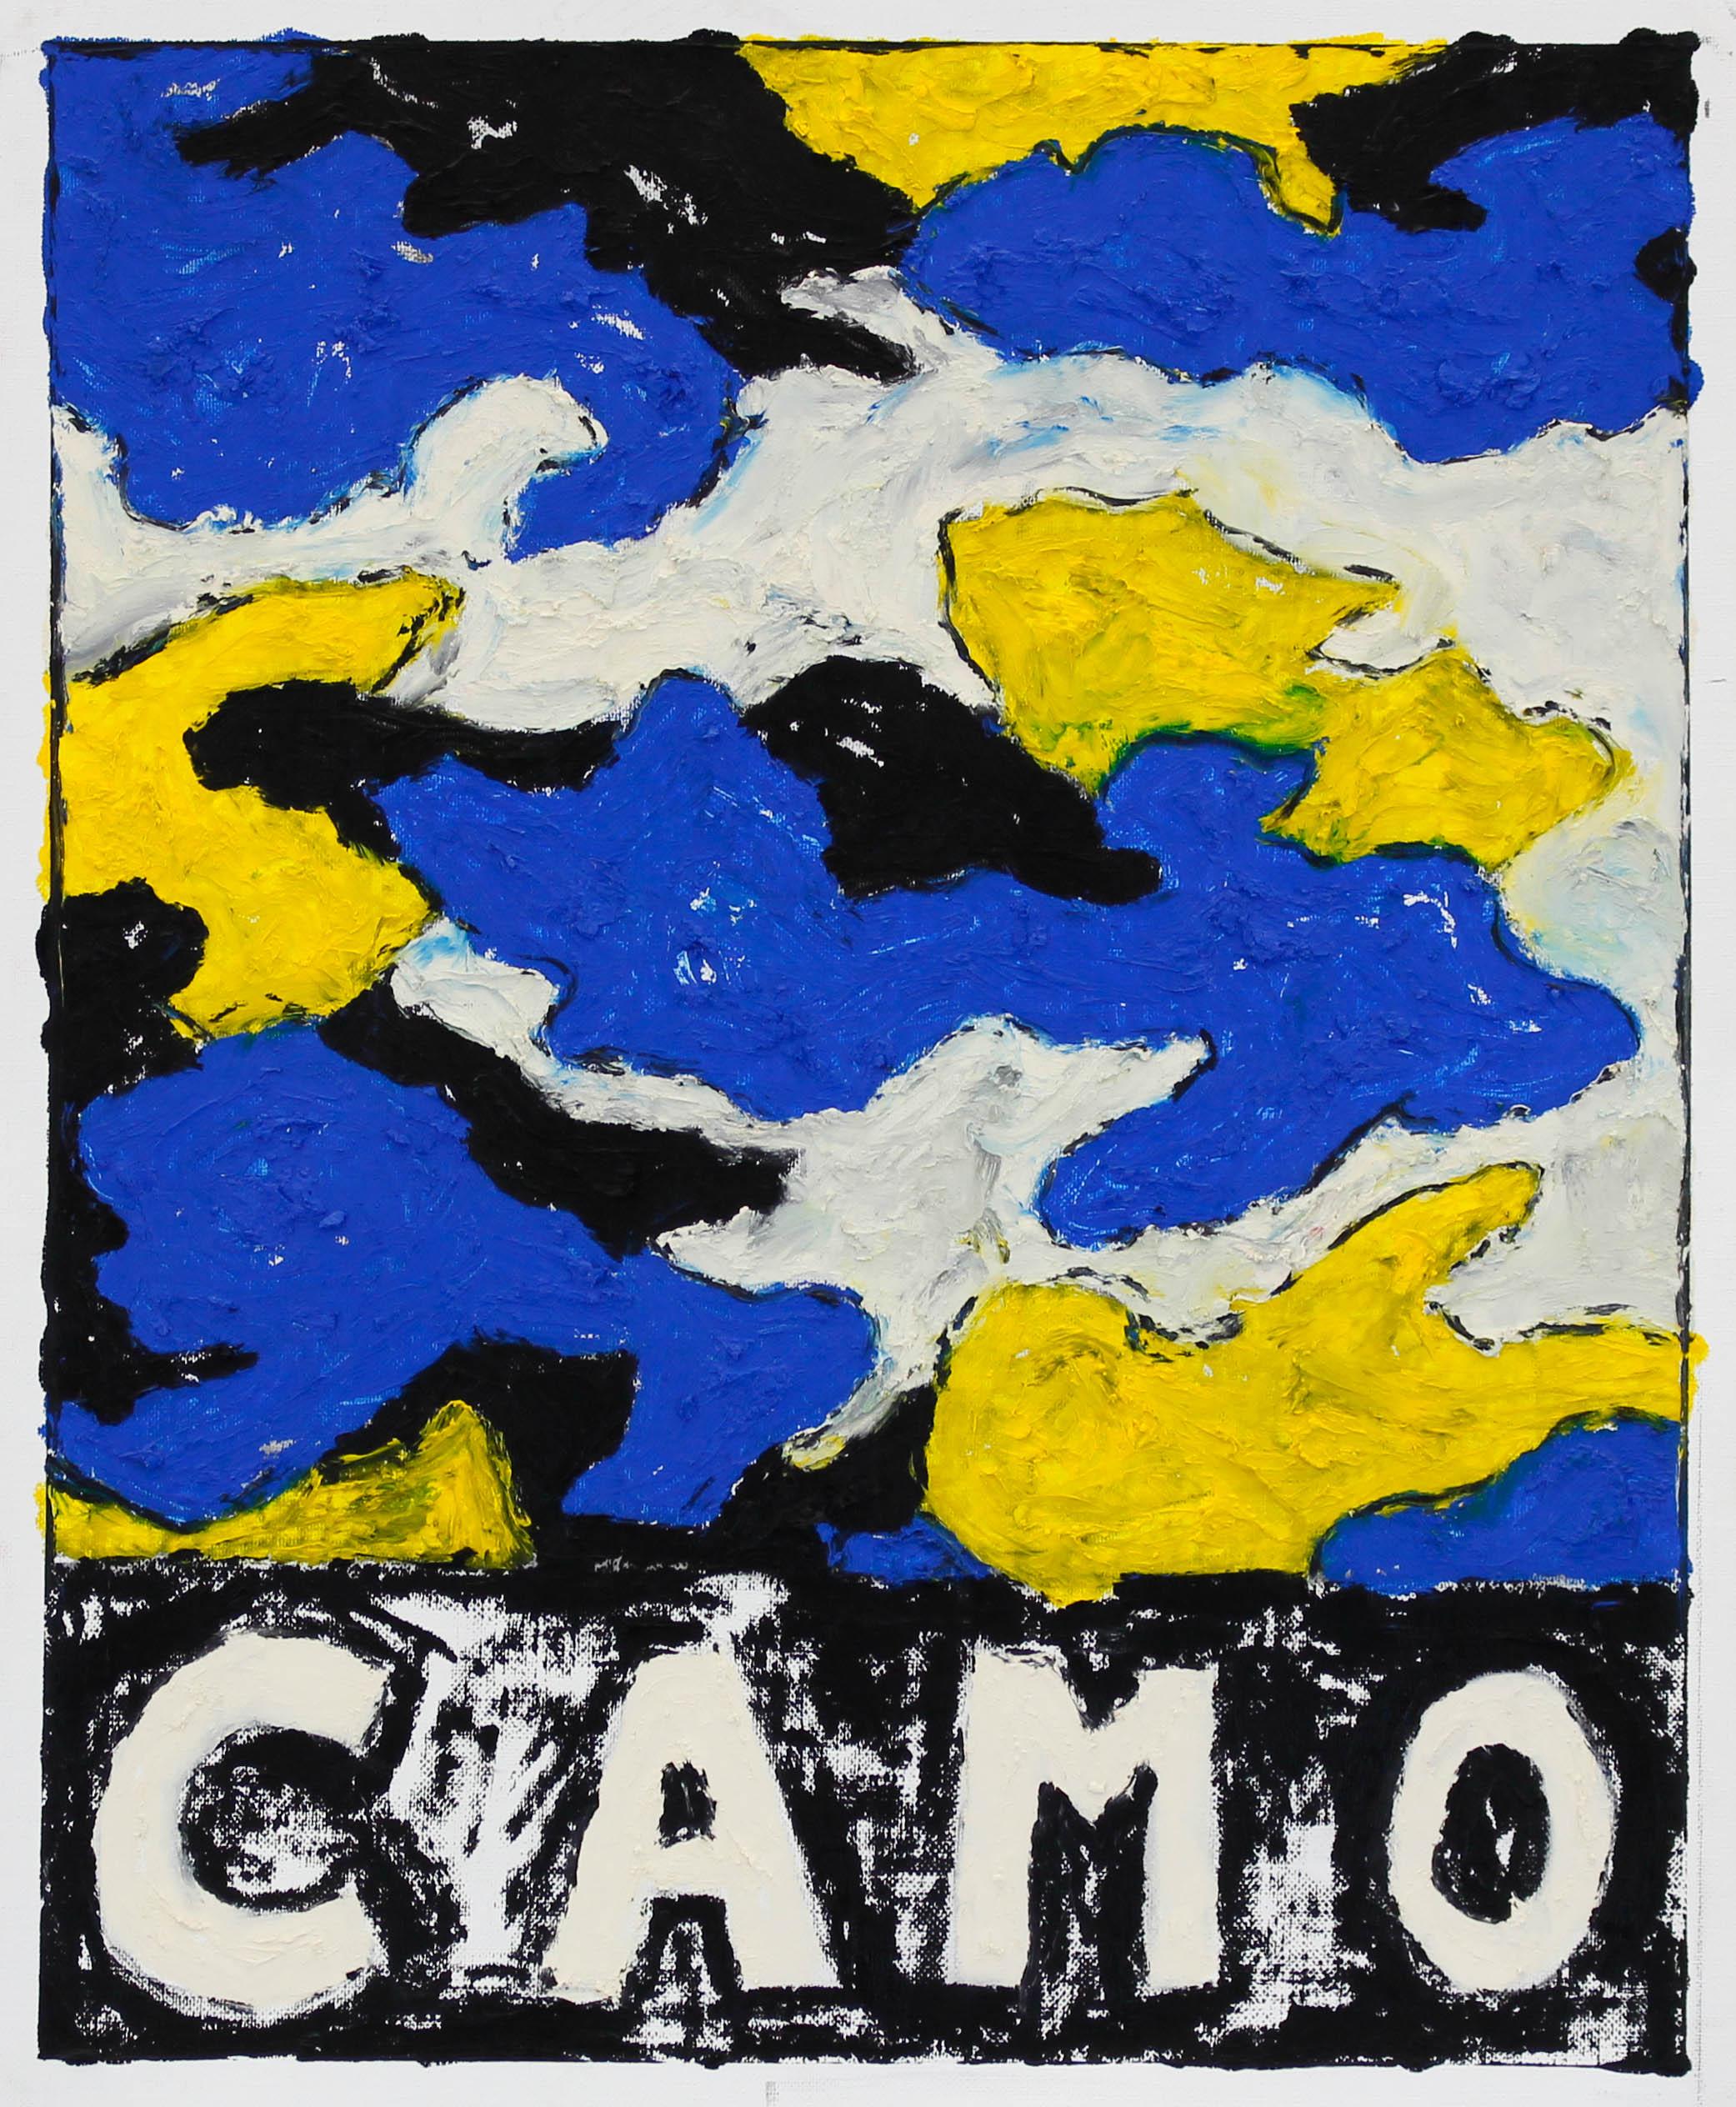 """CAMO (BLU/YLW/WHT/BLCK)"" / 2019 OILSTICK ON UNSTRETCHED CANVAS FRAMED IN WHITE WITH ARTGLASS AR70 42 X 51 CM 4900 NOK"